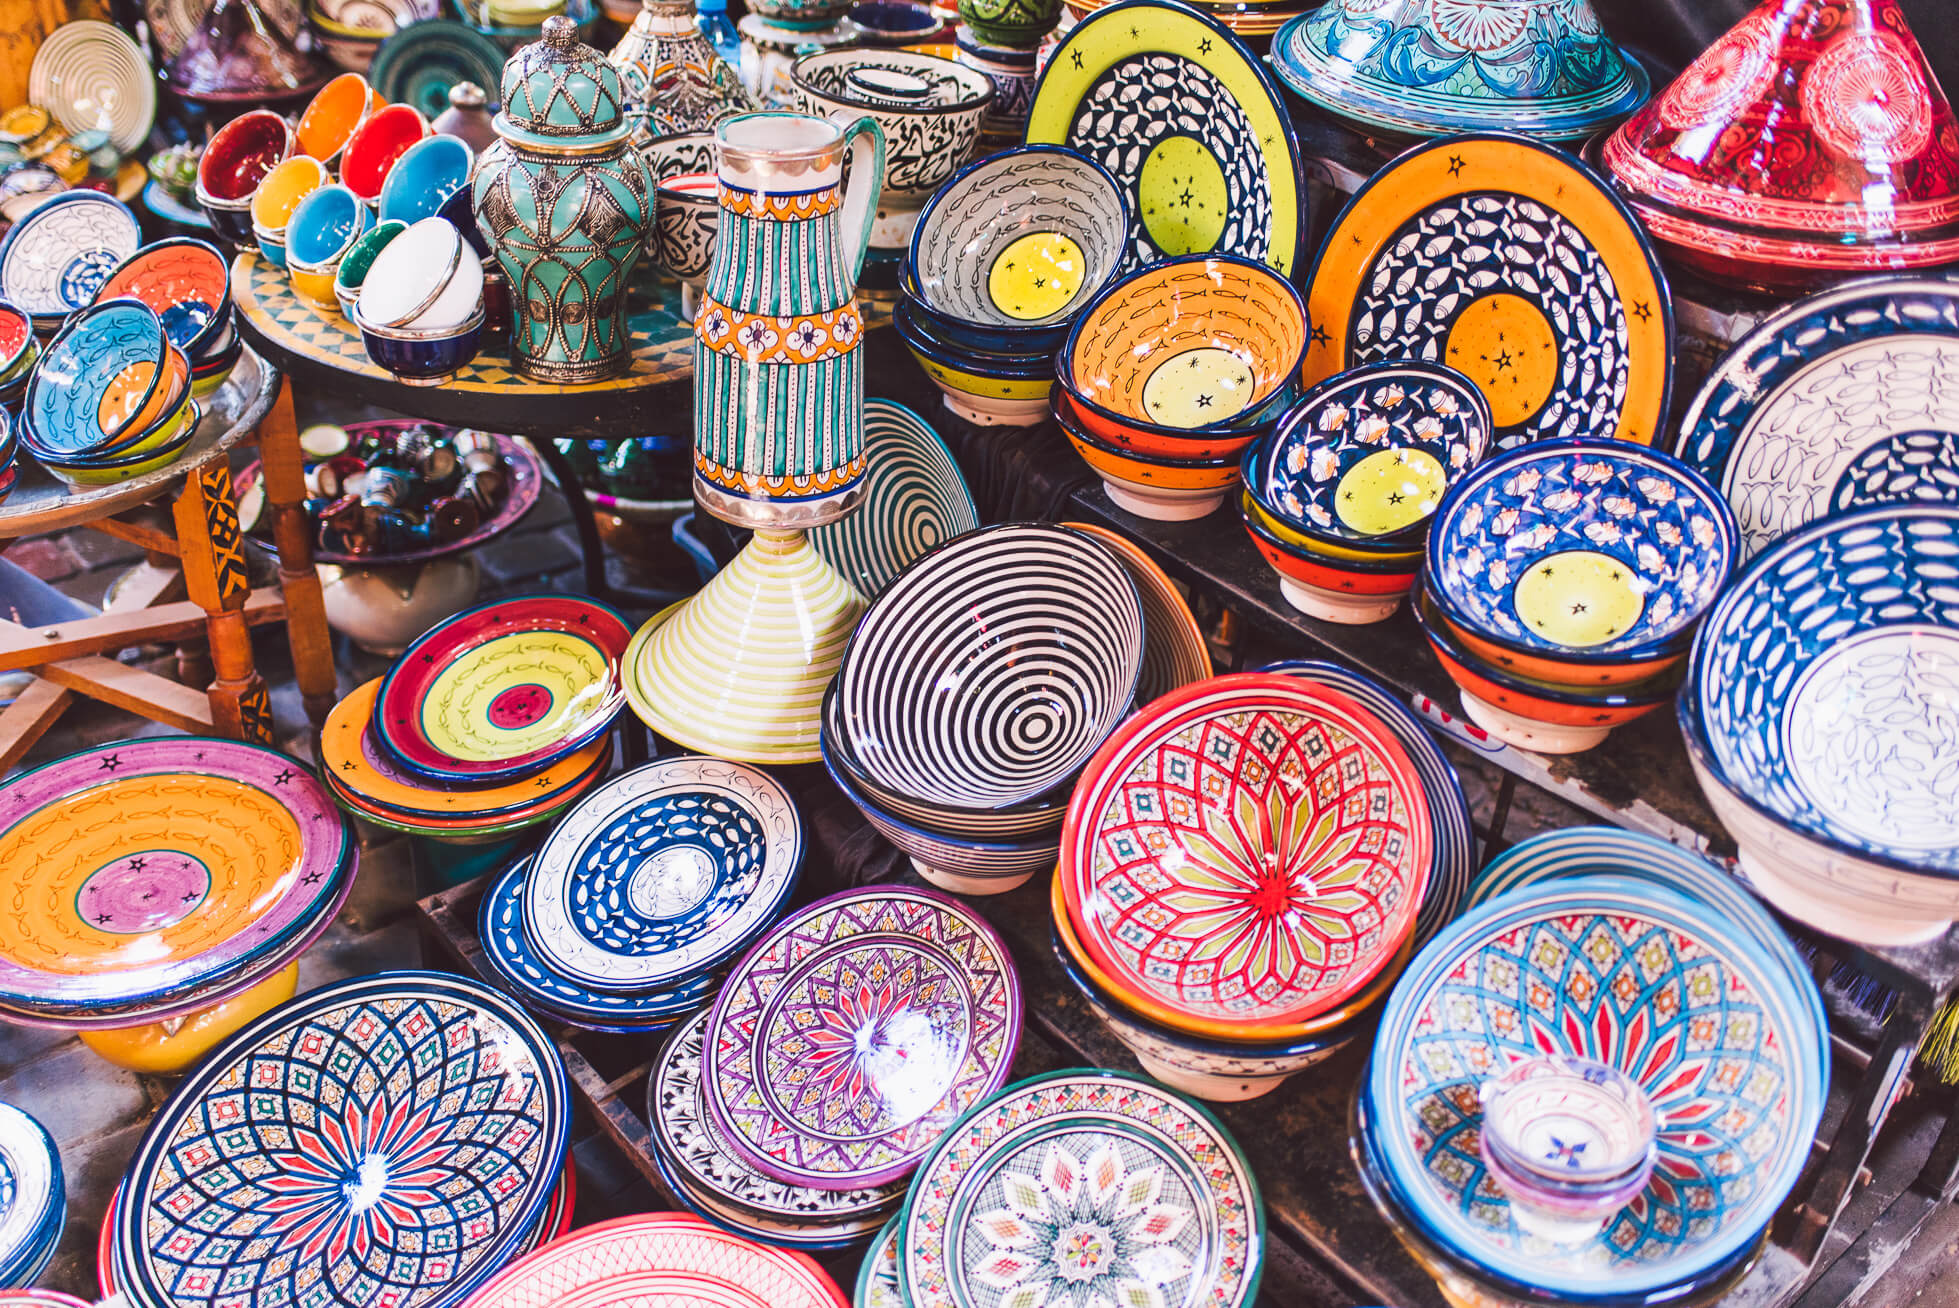 janni-deler-medina-marrakechDSC_0158